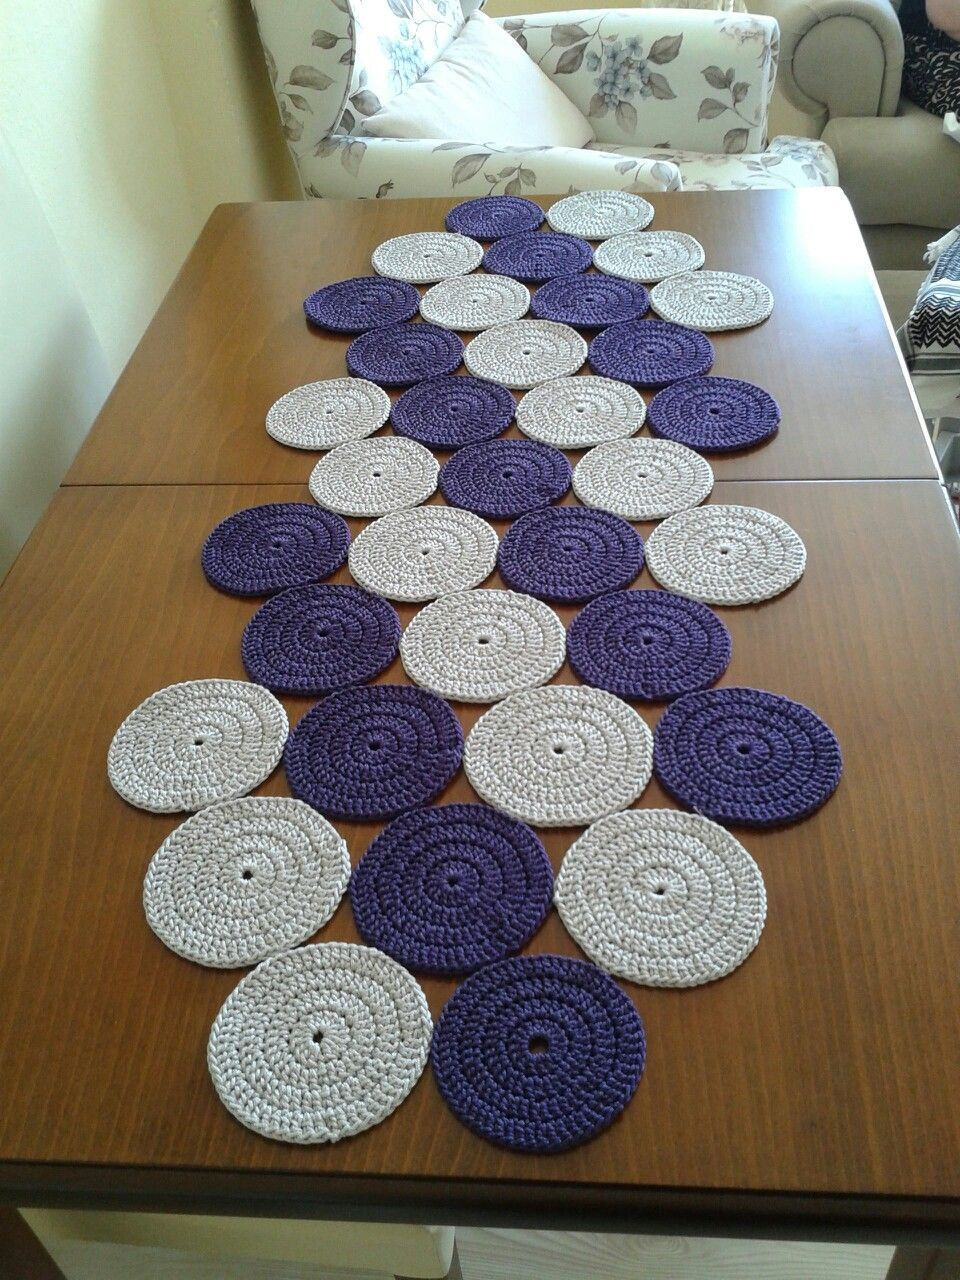 Runner Salvabrani Salvabrani Artofit Artofit Crochet Lavoro